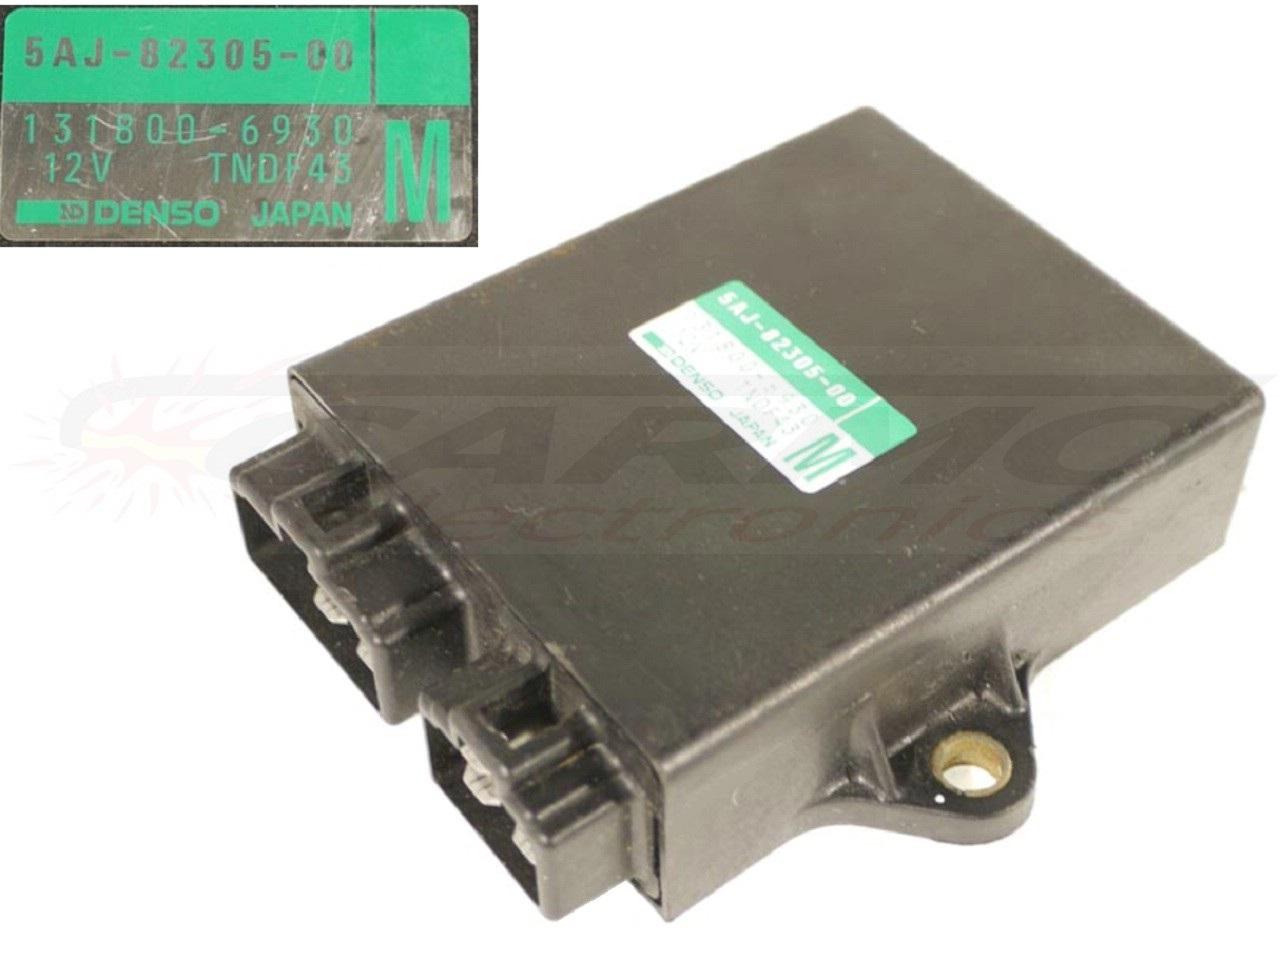 1988 toyota corolla electrical wiring diagram toyota electrical wiring diagram corolla 1988 model